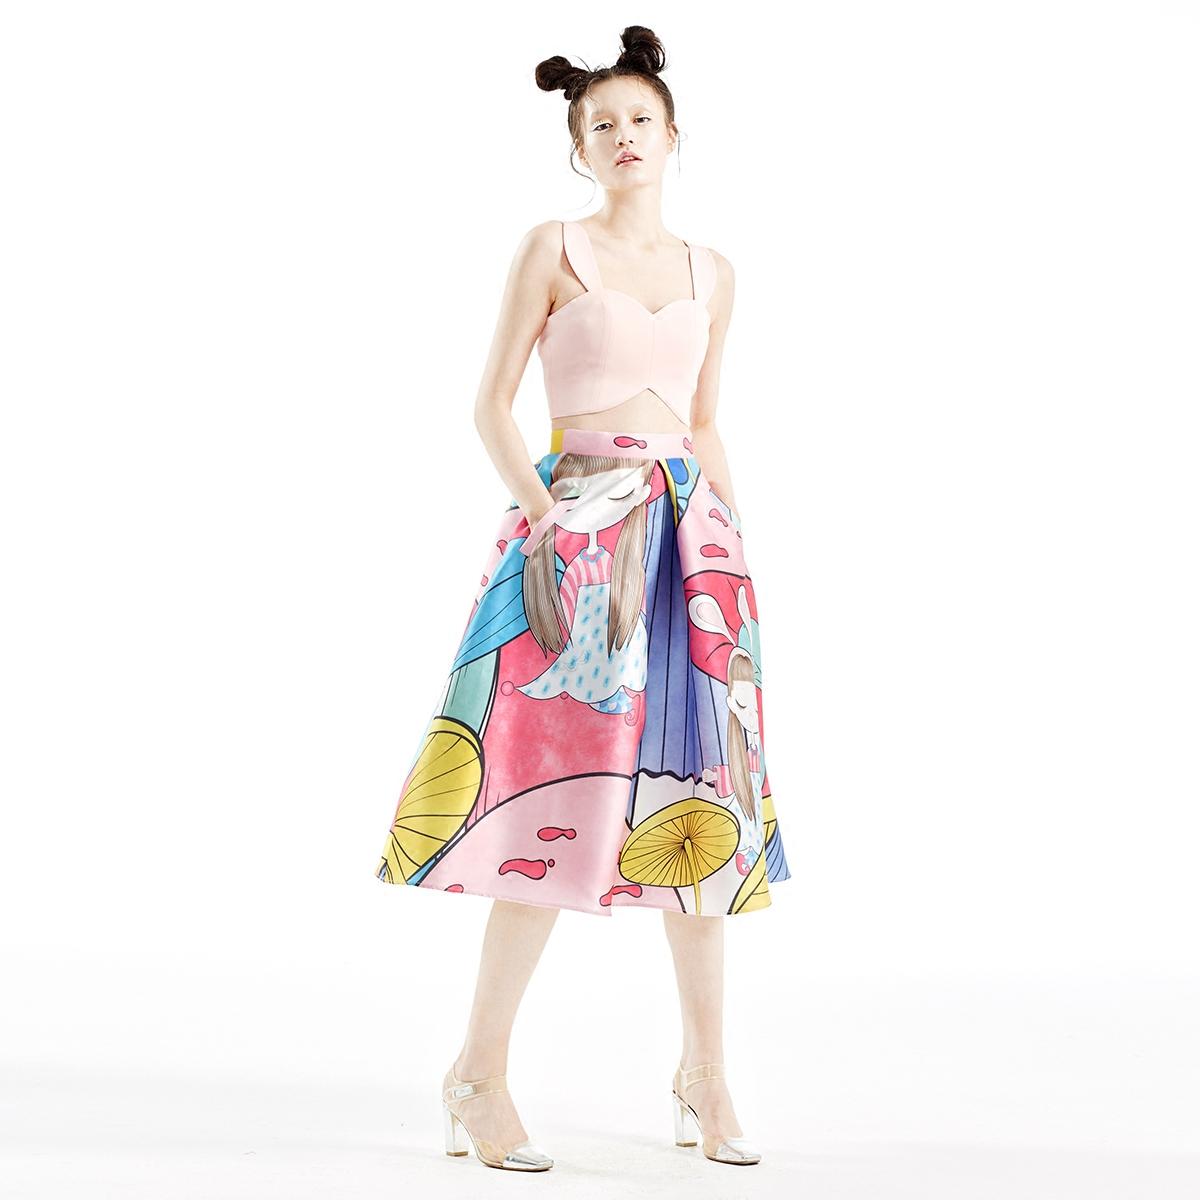 SUNGDO GIN春夏白日梦粉色冰激凌色超短款露脐圆弧短款时髦背心